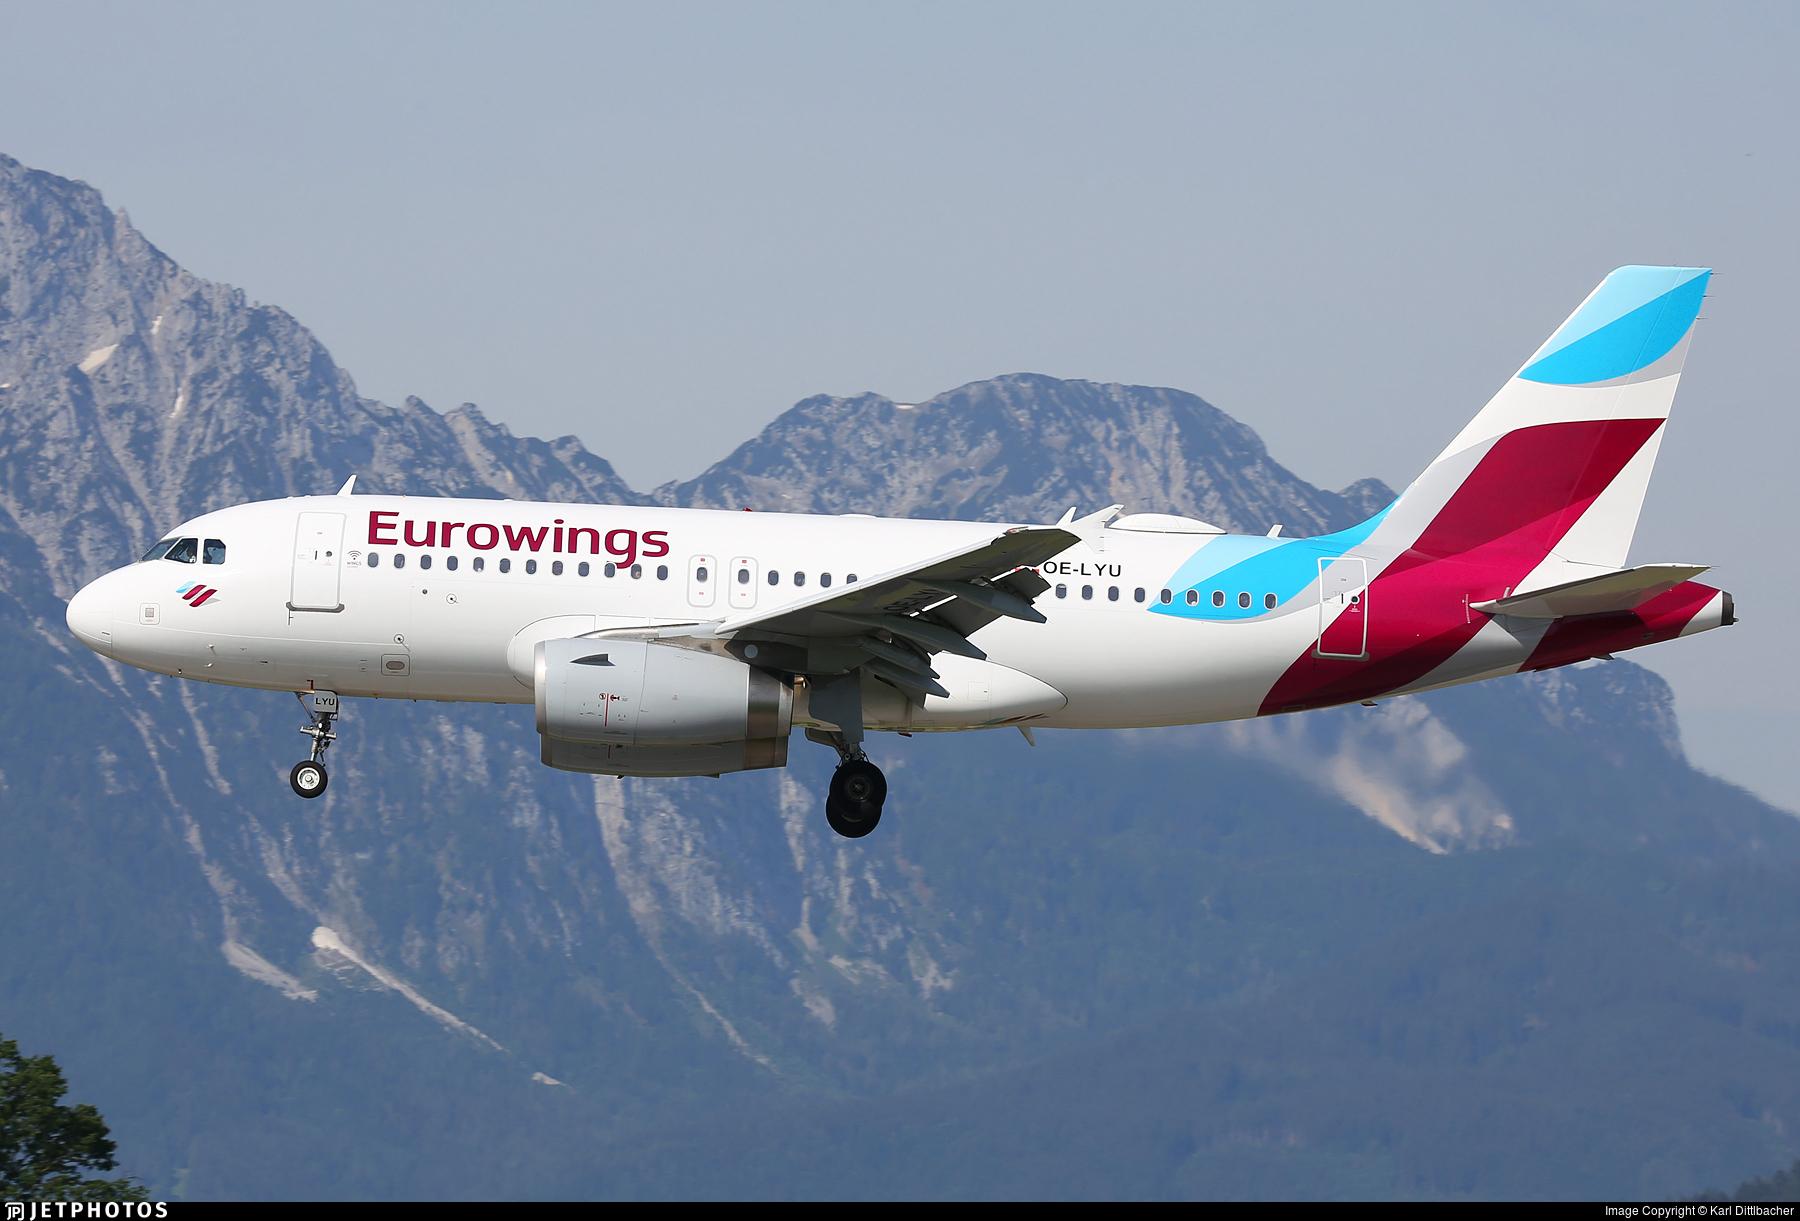 OE-LYU - Airbus A319-132 - Eurowings Europe